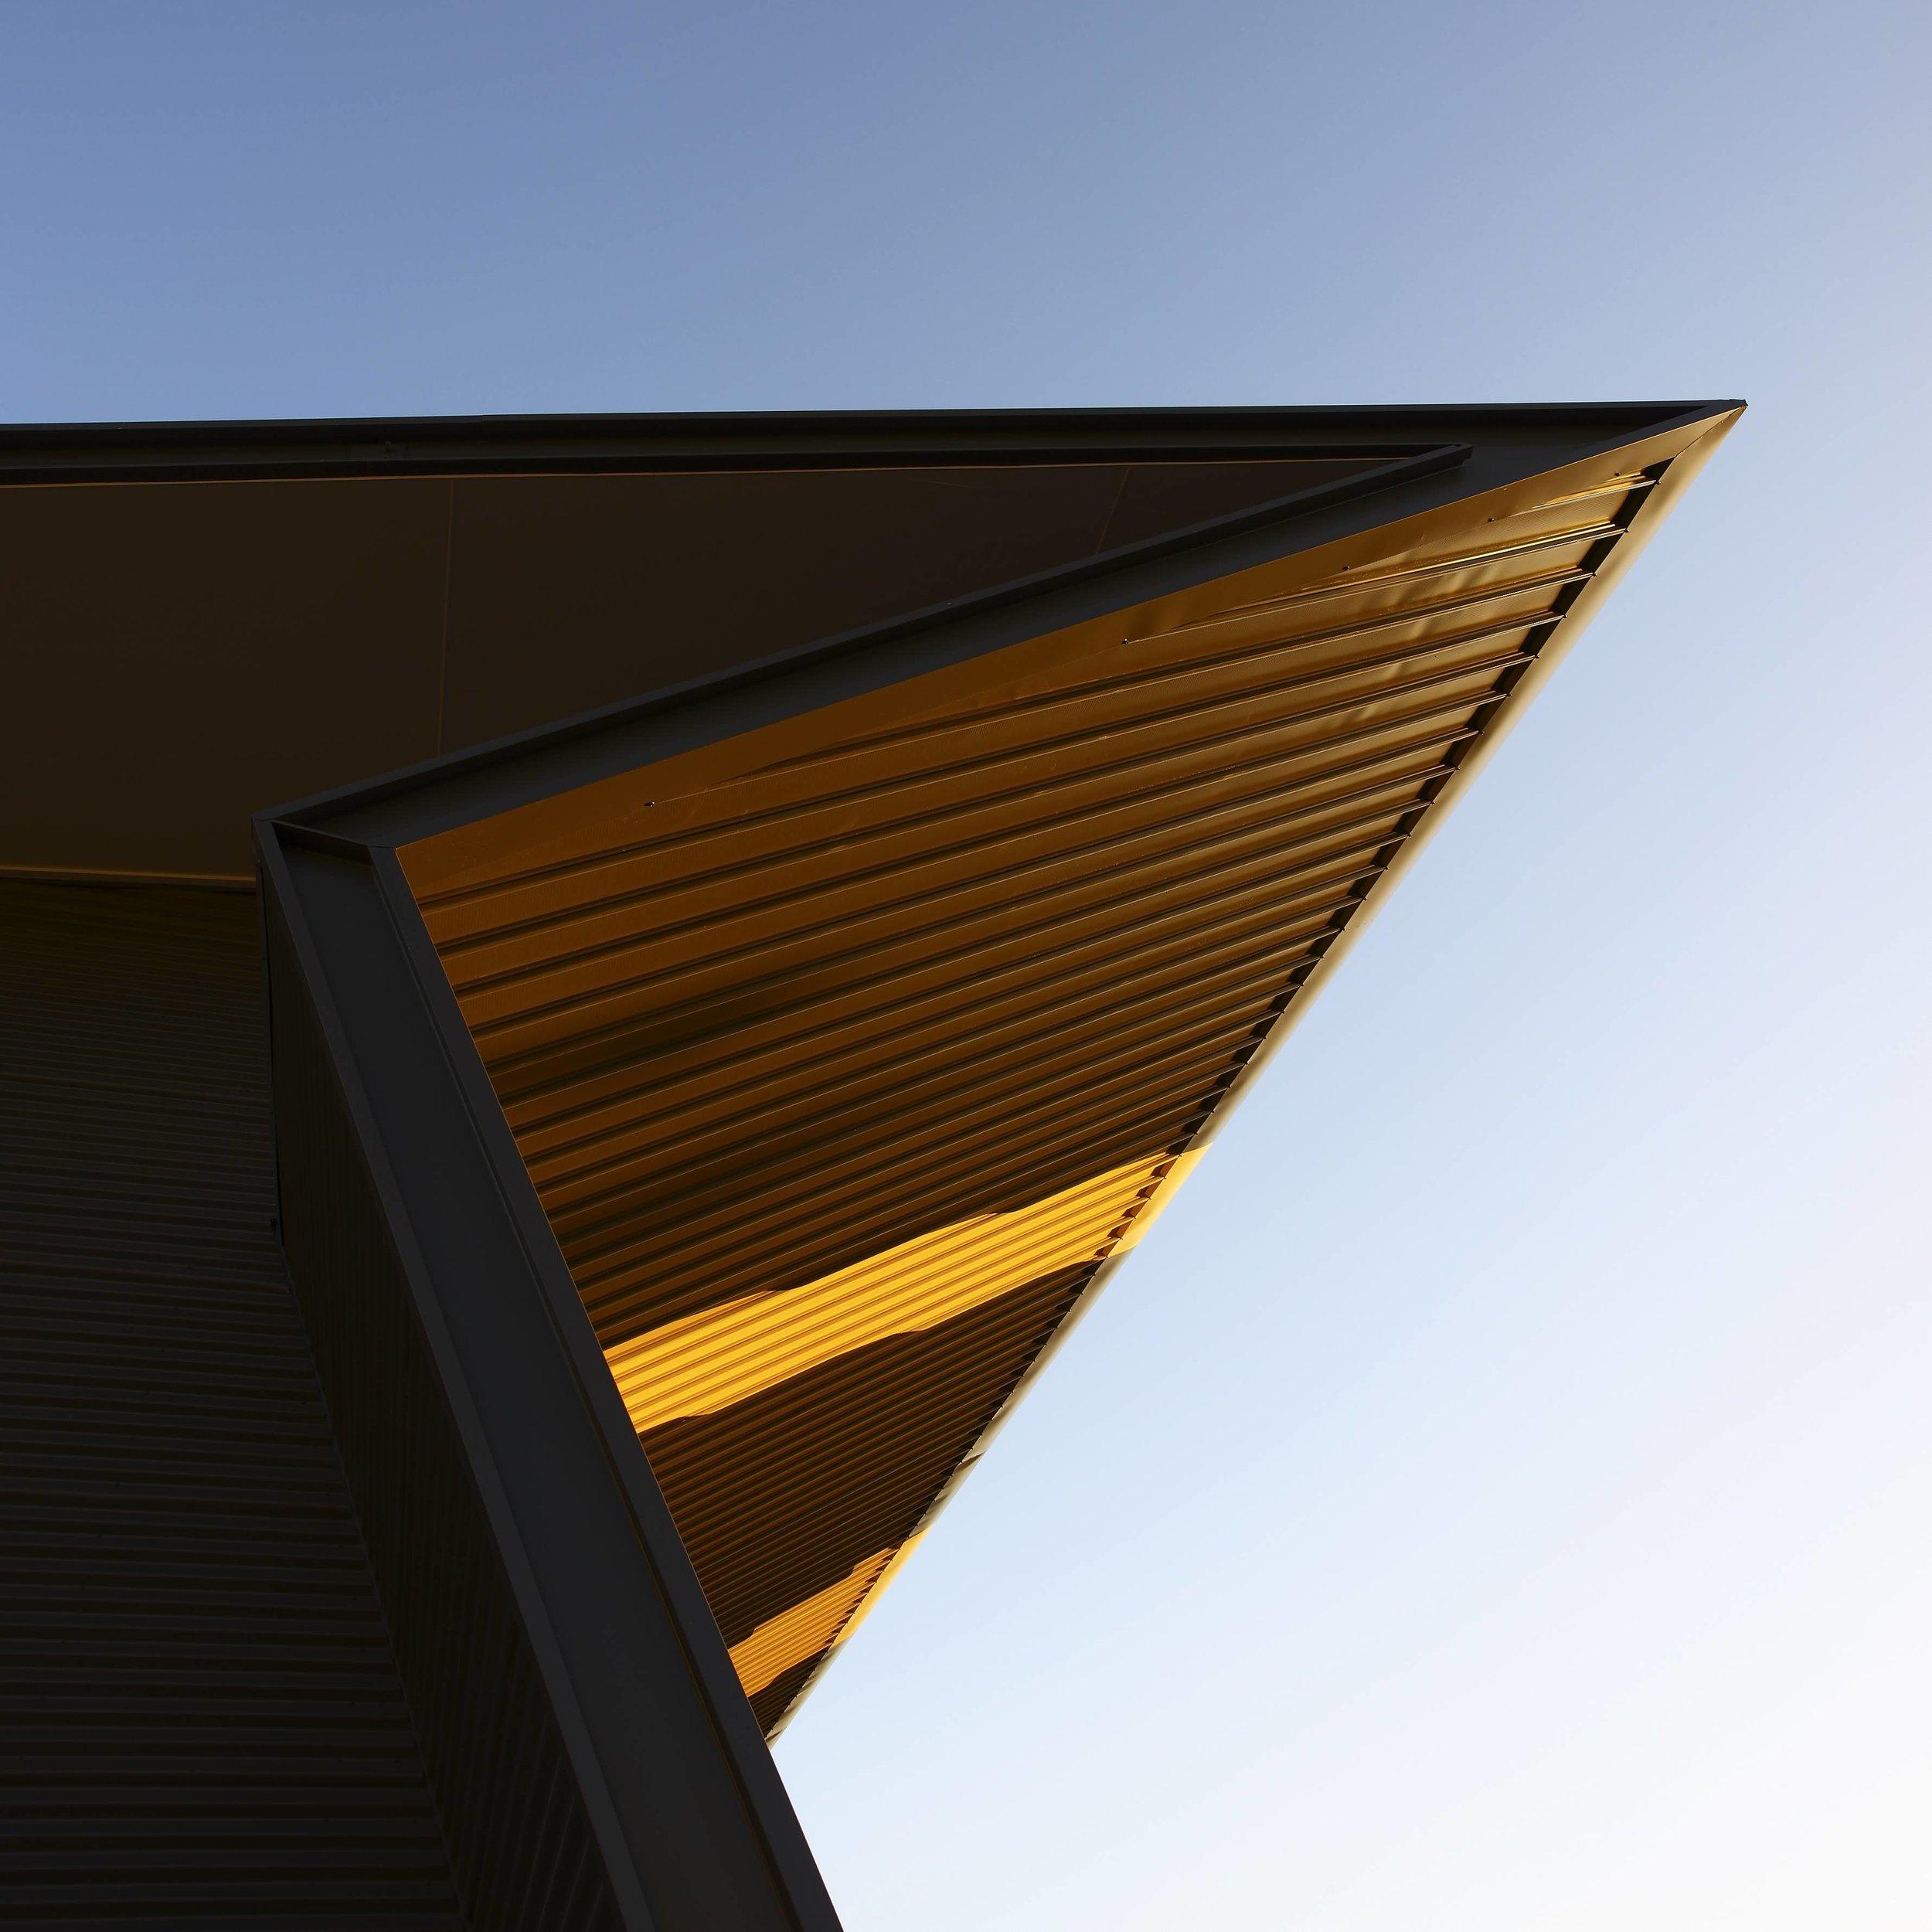 Guymer-bailey-architects-4WD-opposite-lock-06.jpg